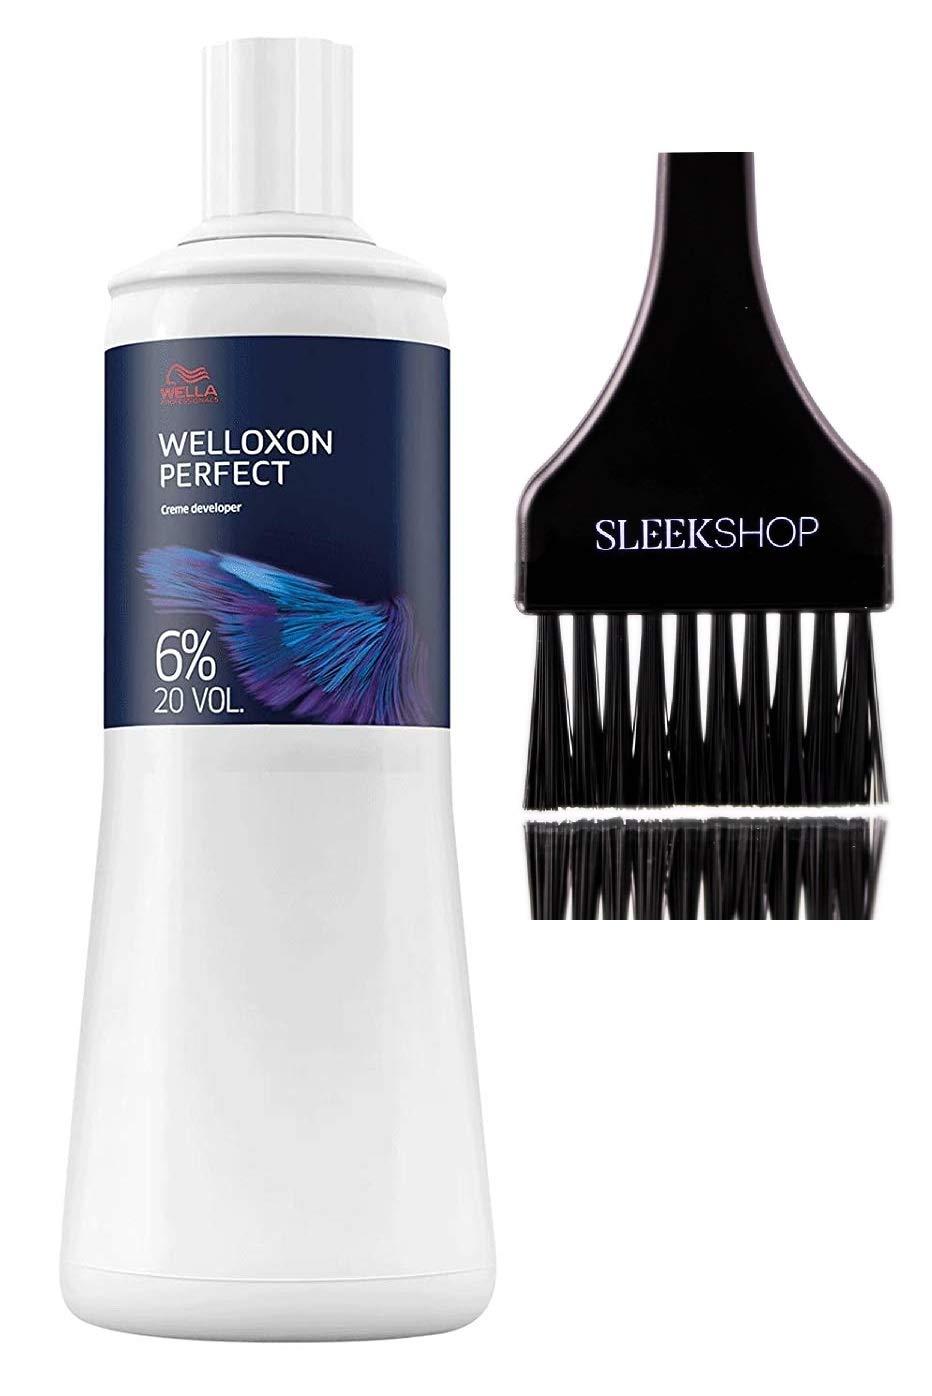 Wella KOLESTON WELLOXON PERFECT Cream Developer (with Sleek Tint Brush) (20 Volume/6% - 33.8 oz liter)